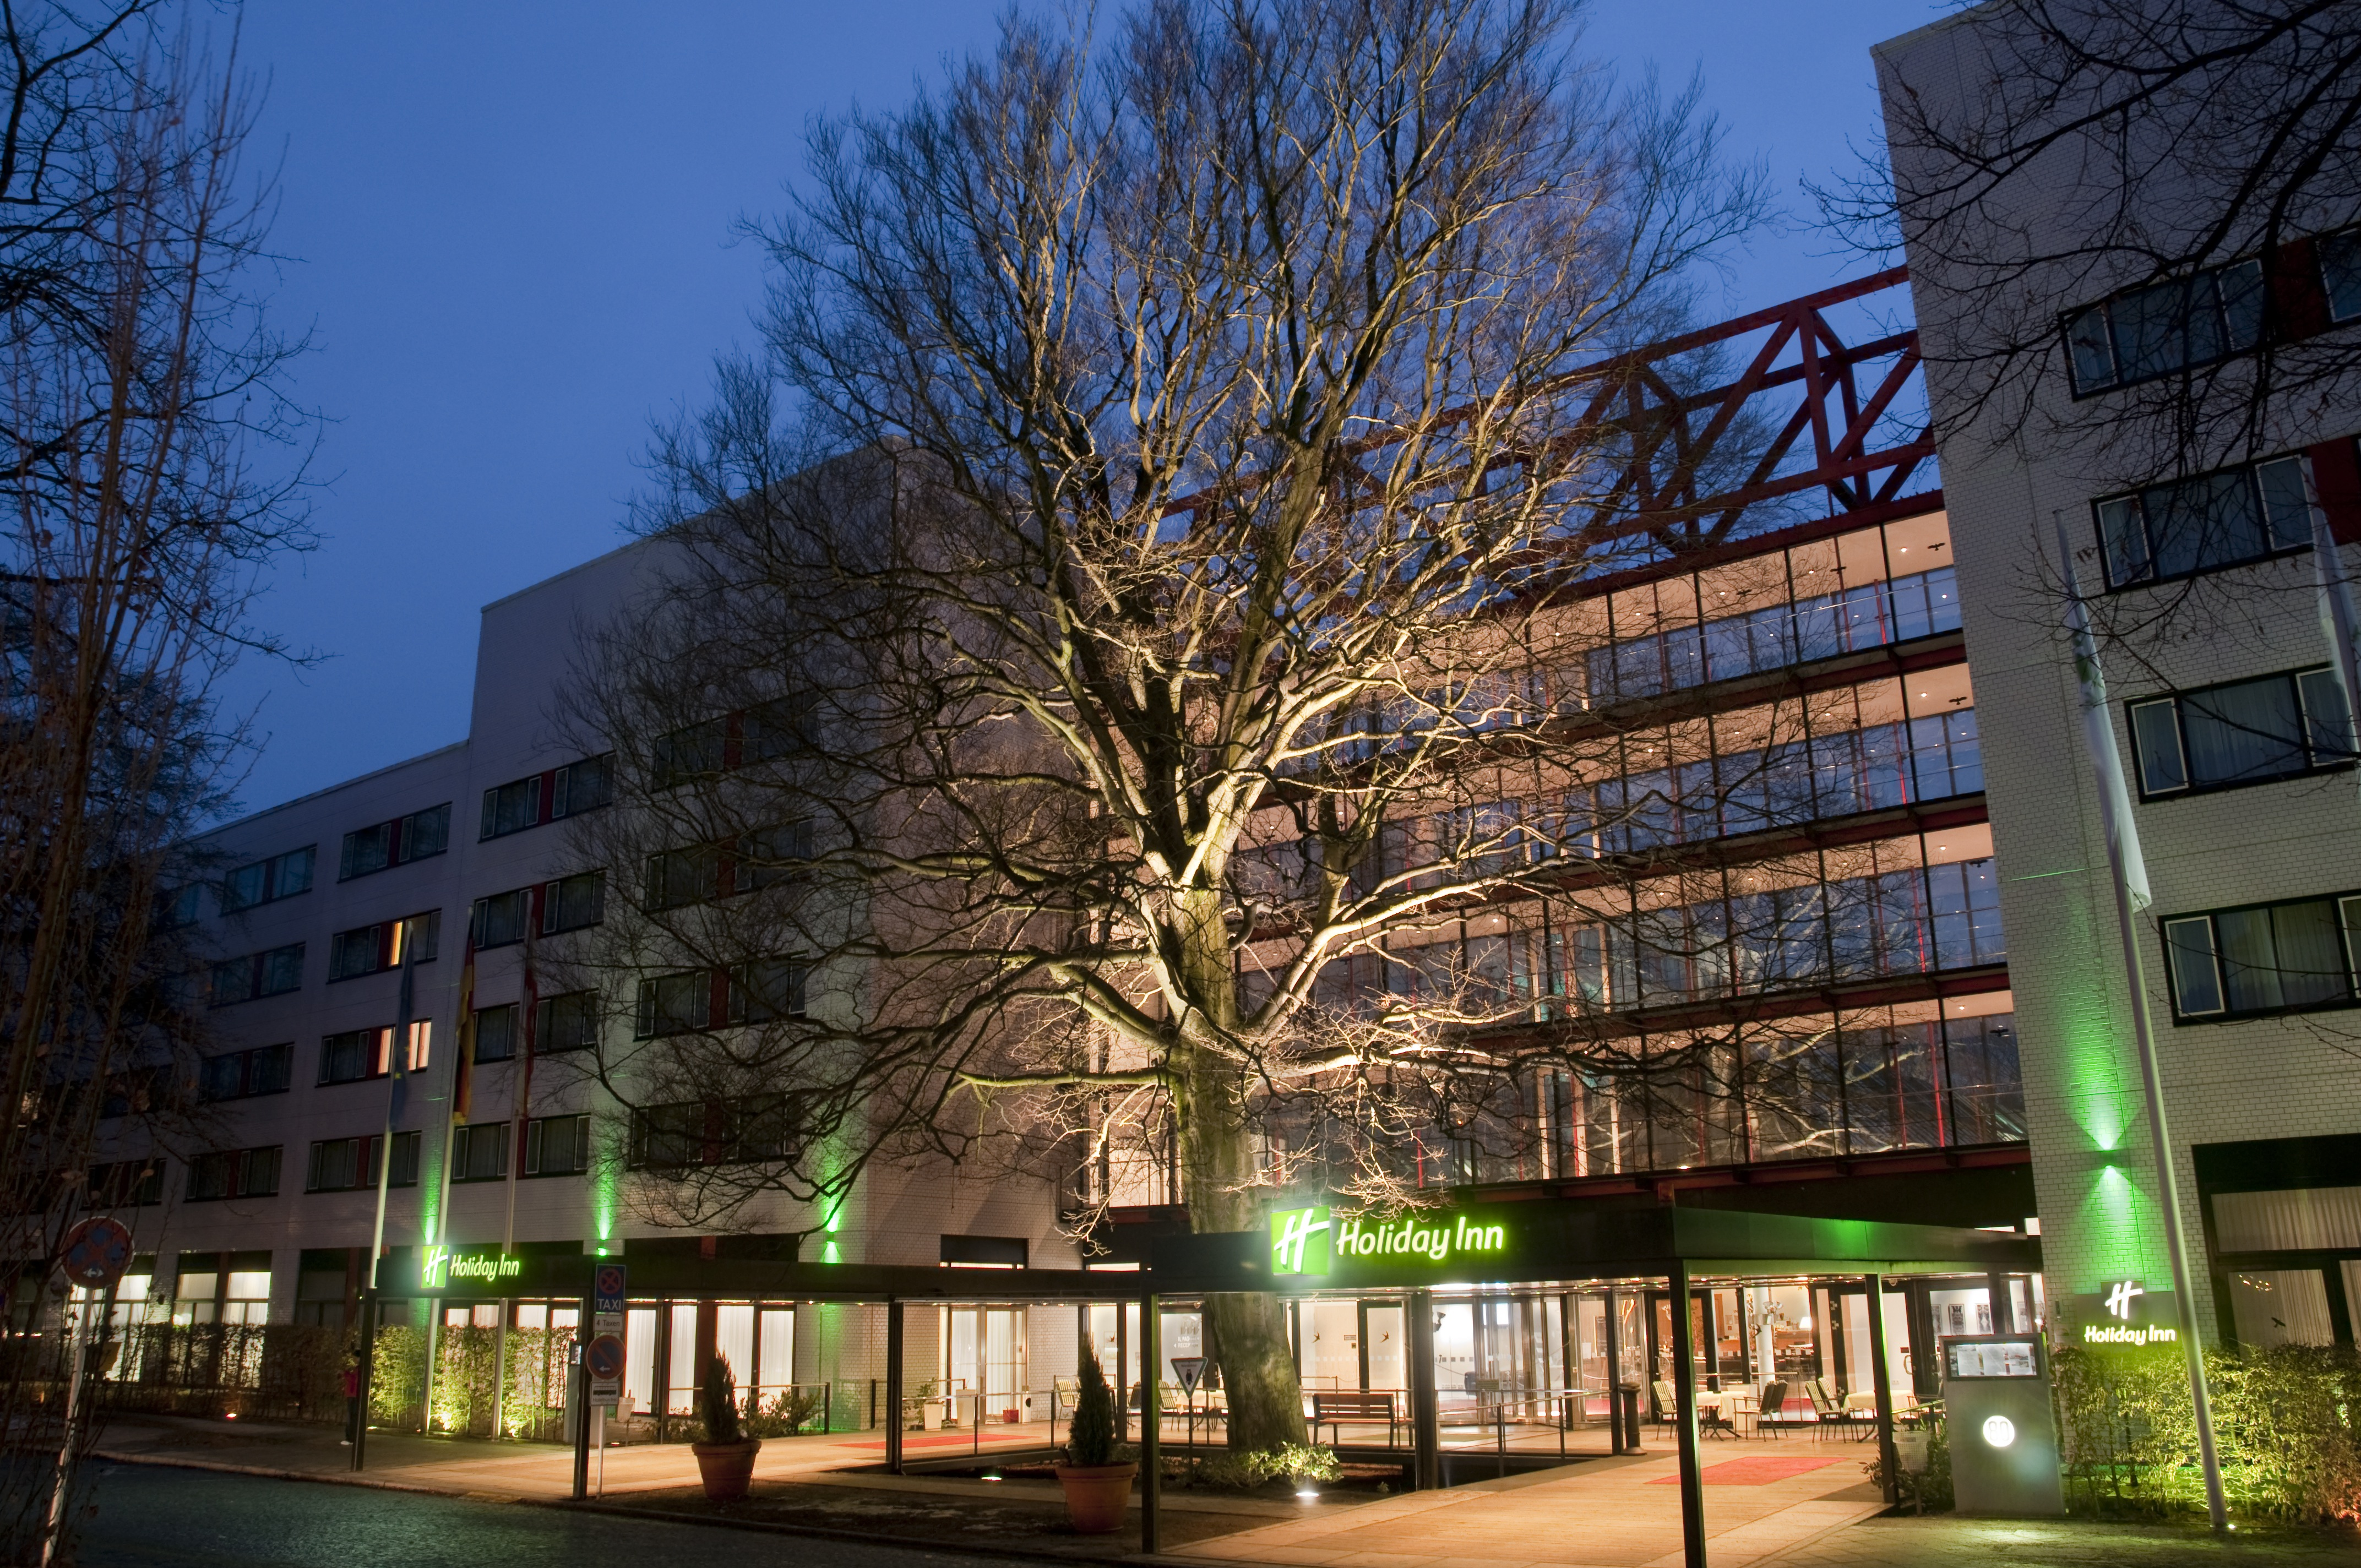 Holiday Inn Berlin – City West